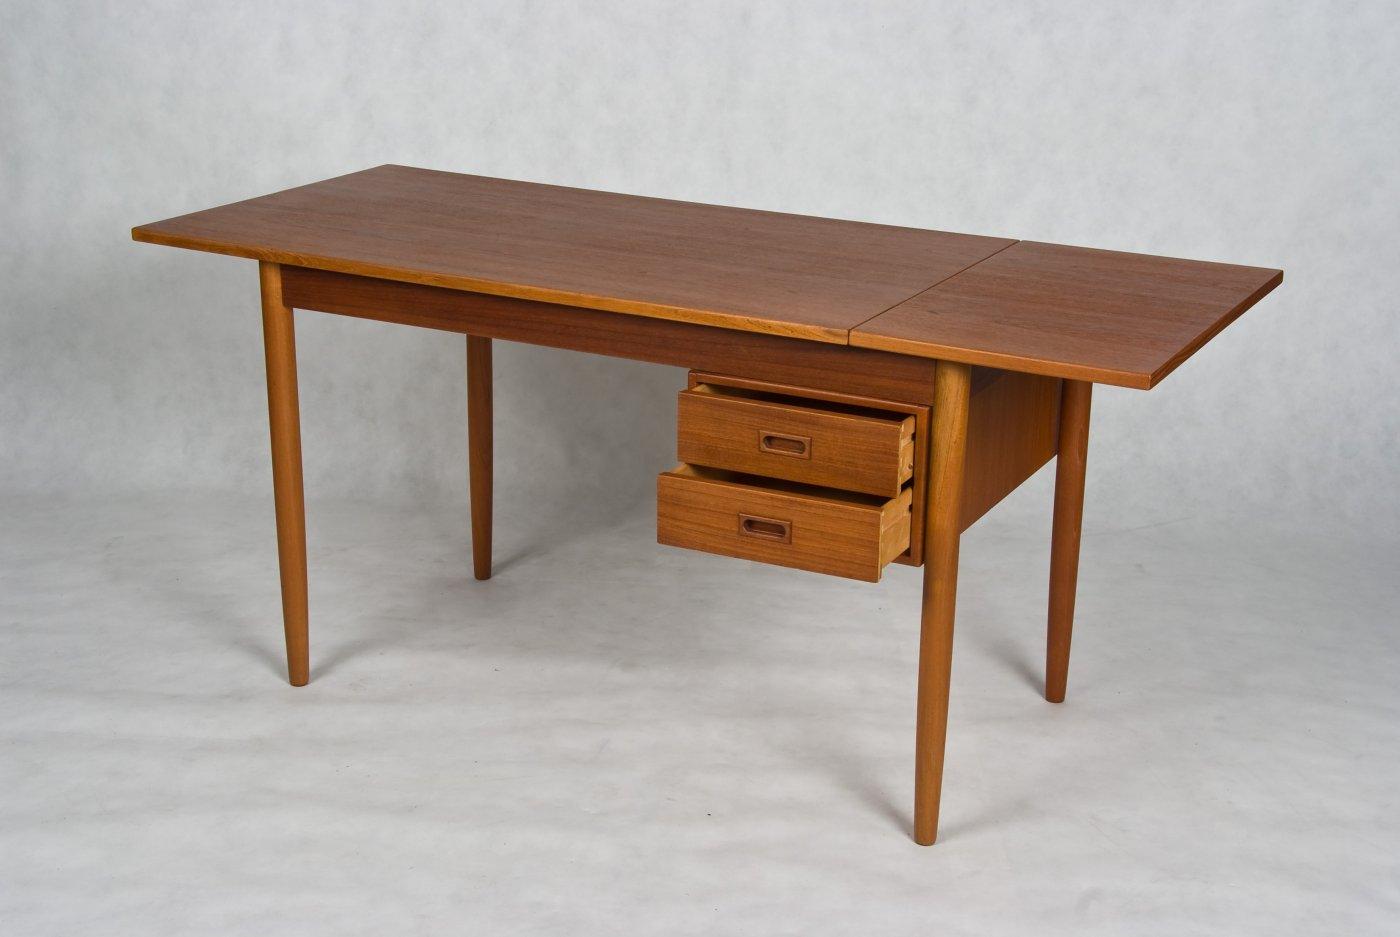 Small Danish Vintage Desk Teak And Oak